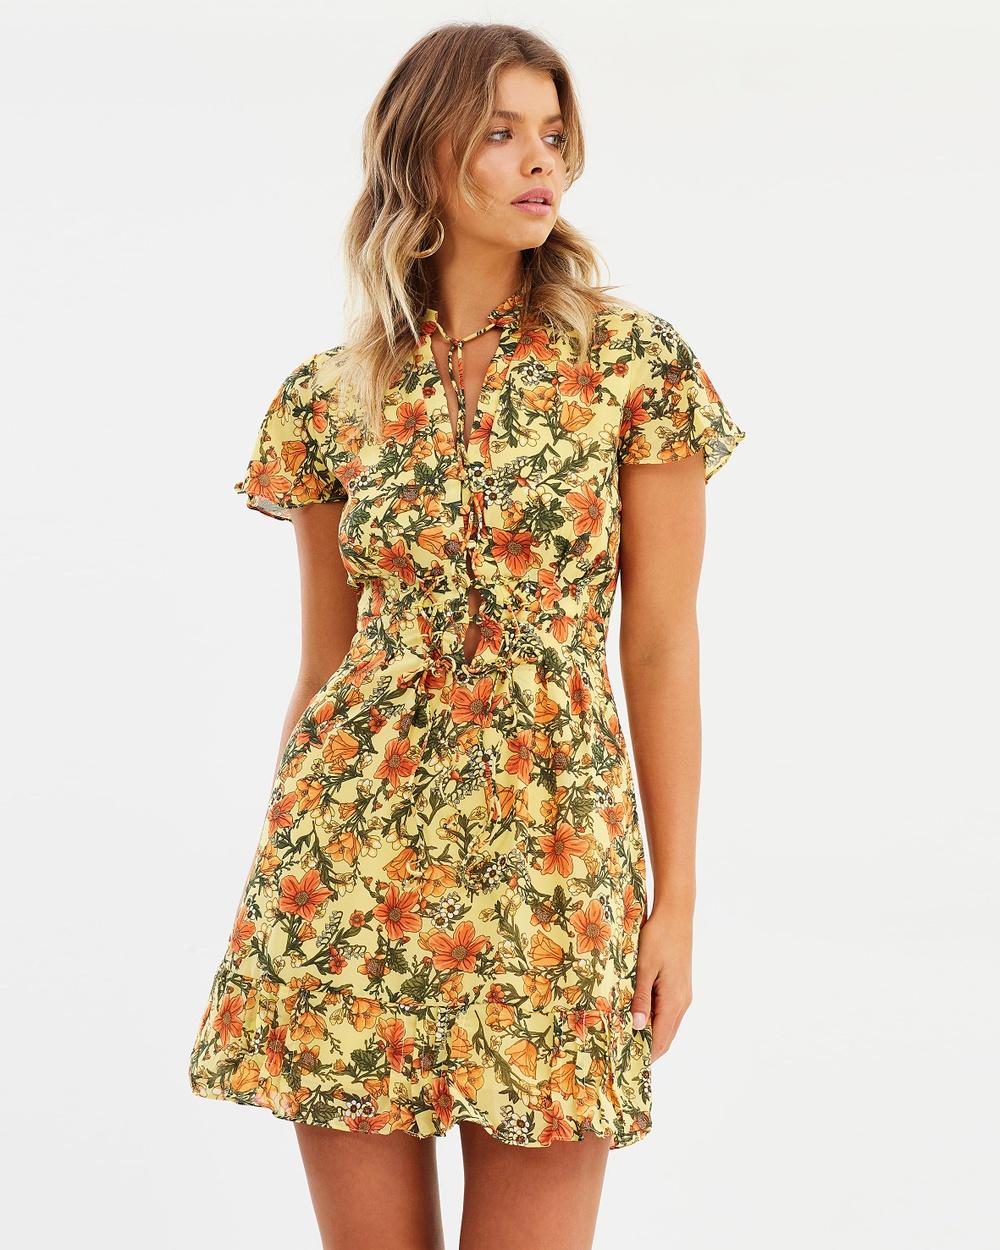 Atmos & Here ICONIC EXCLUSIVE Zelda Mini Dress Printed Dresses Wild Flowers ICONIC EXCLUSIVE Zelda Mini Dress